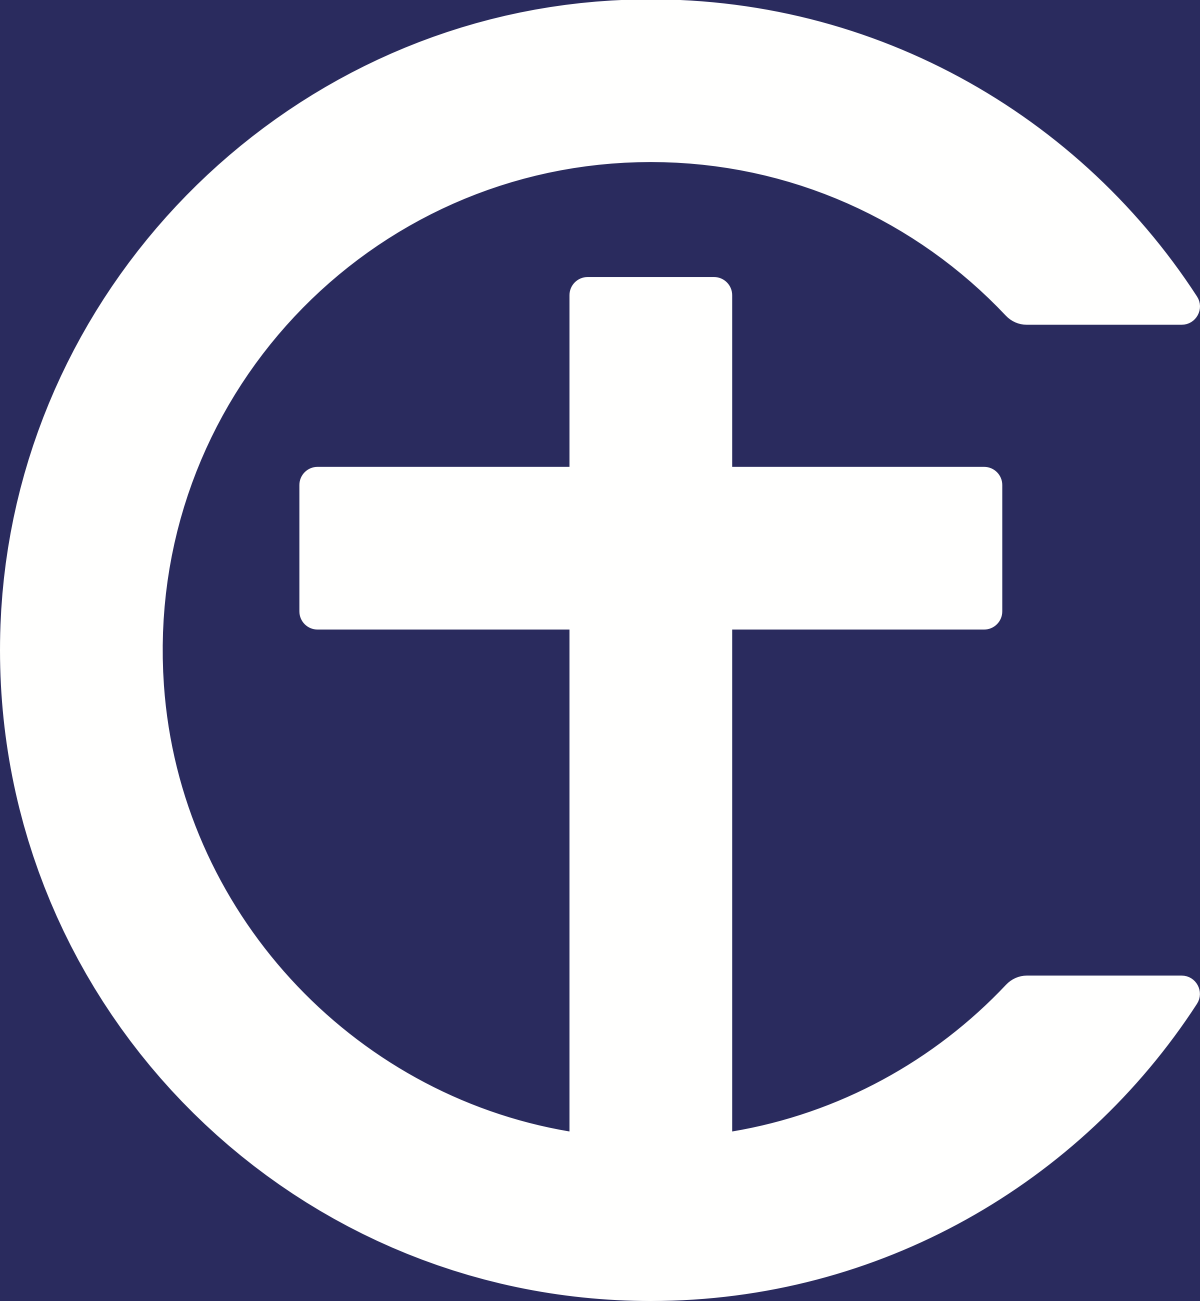 Christ Community Church Logo #10